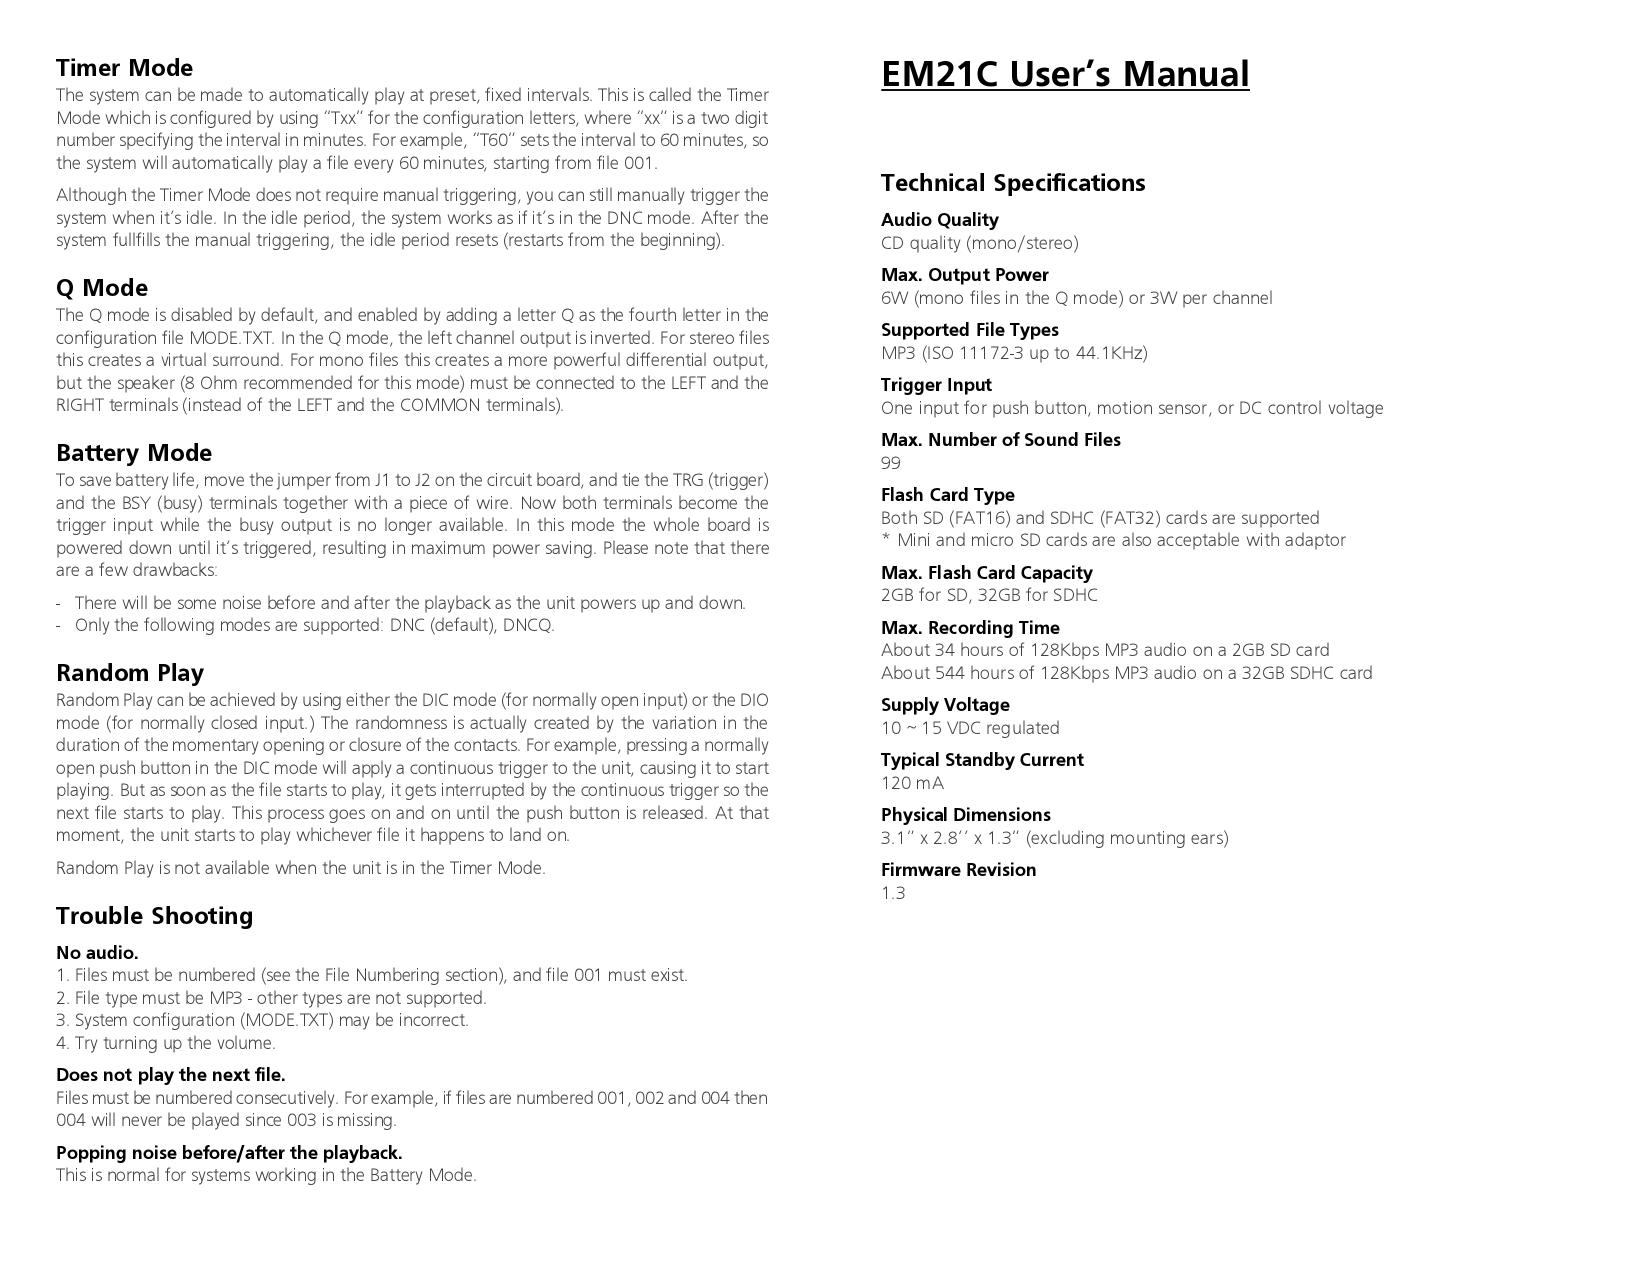 download free pdf for iriver t60 2gb mp3 player manual rh umlib com